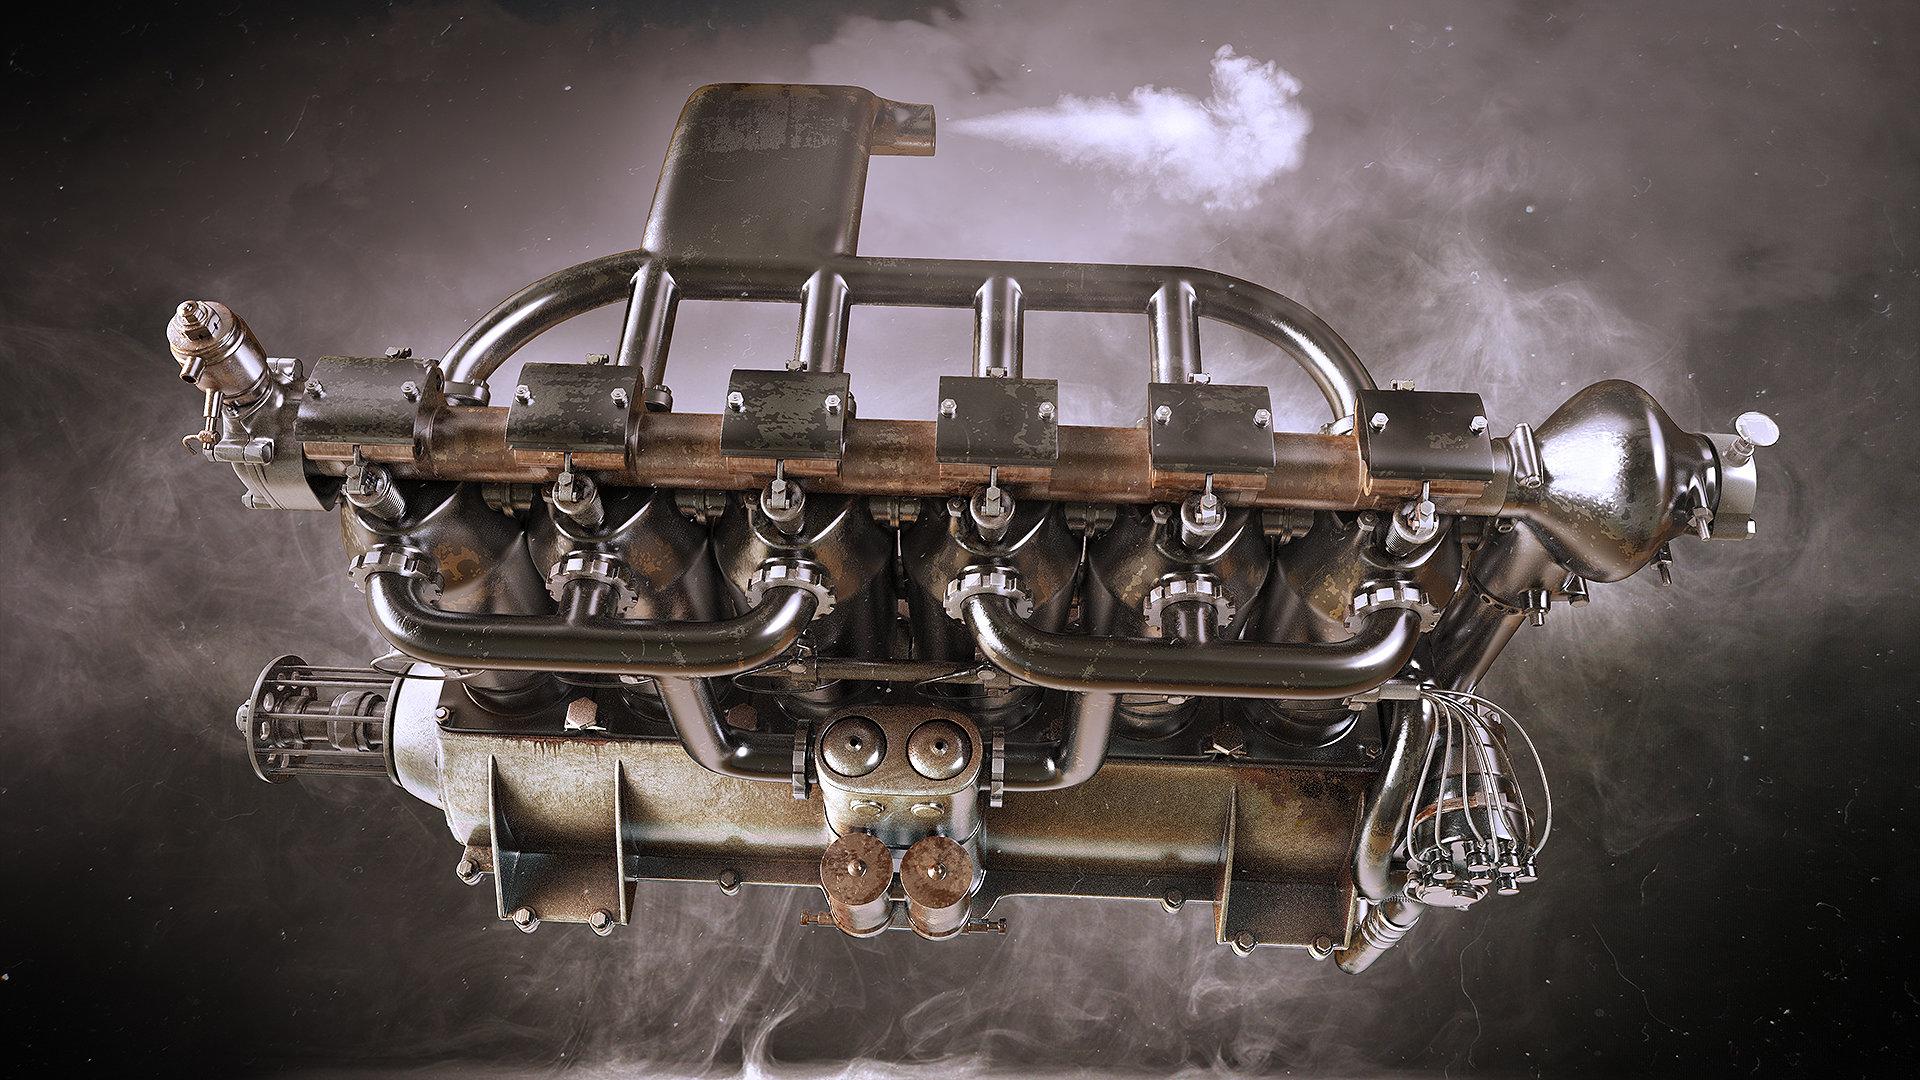 Alexandr novitskiy mercedes diii engine 02